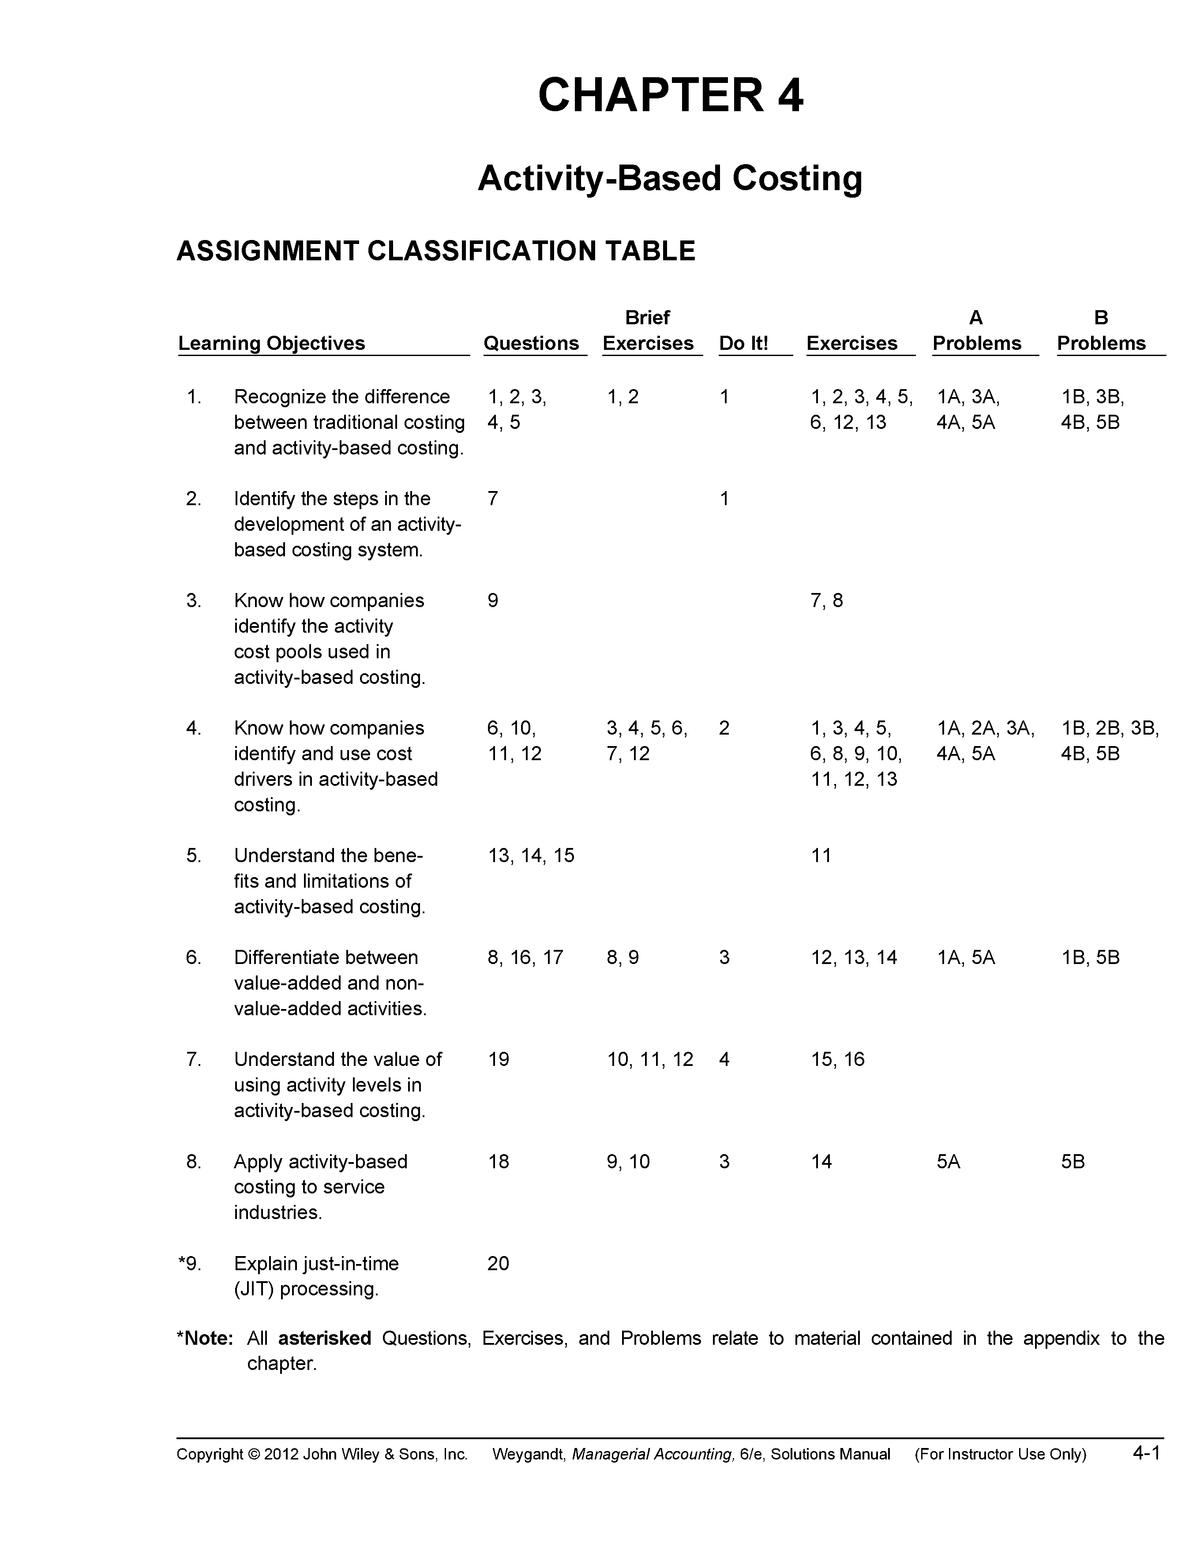 manual j table 4a